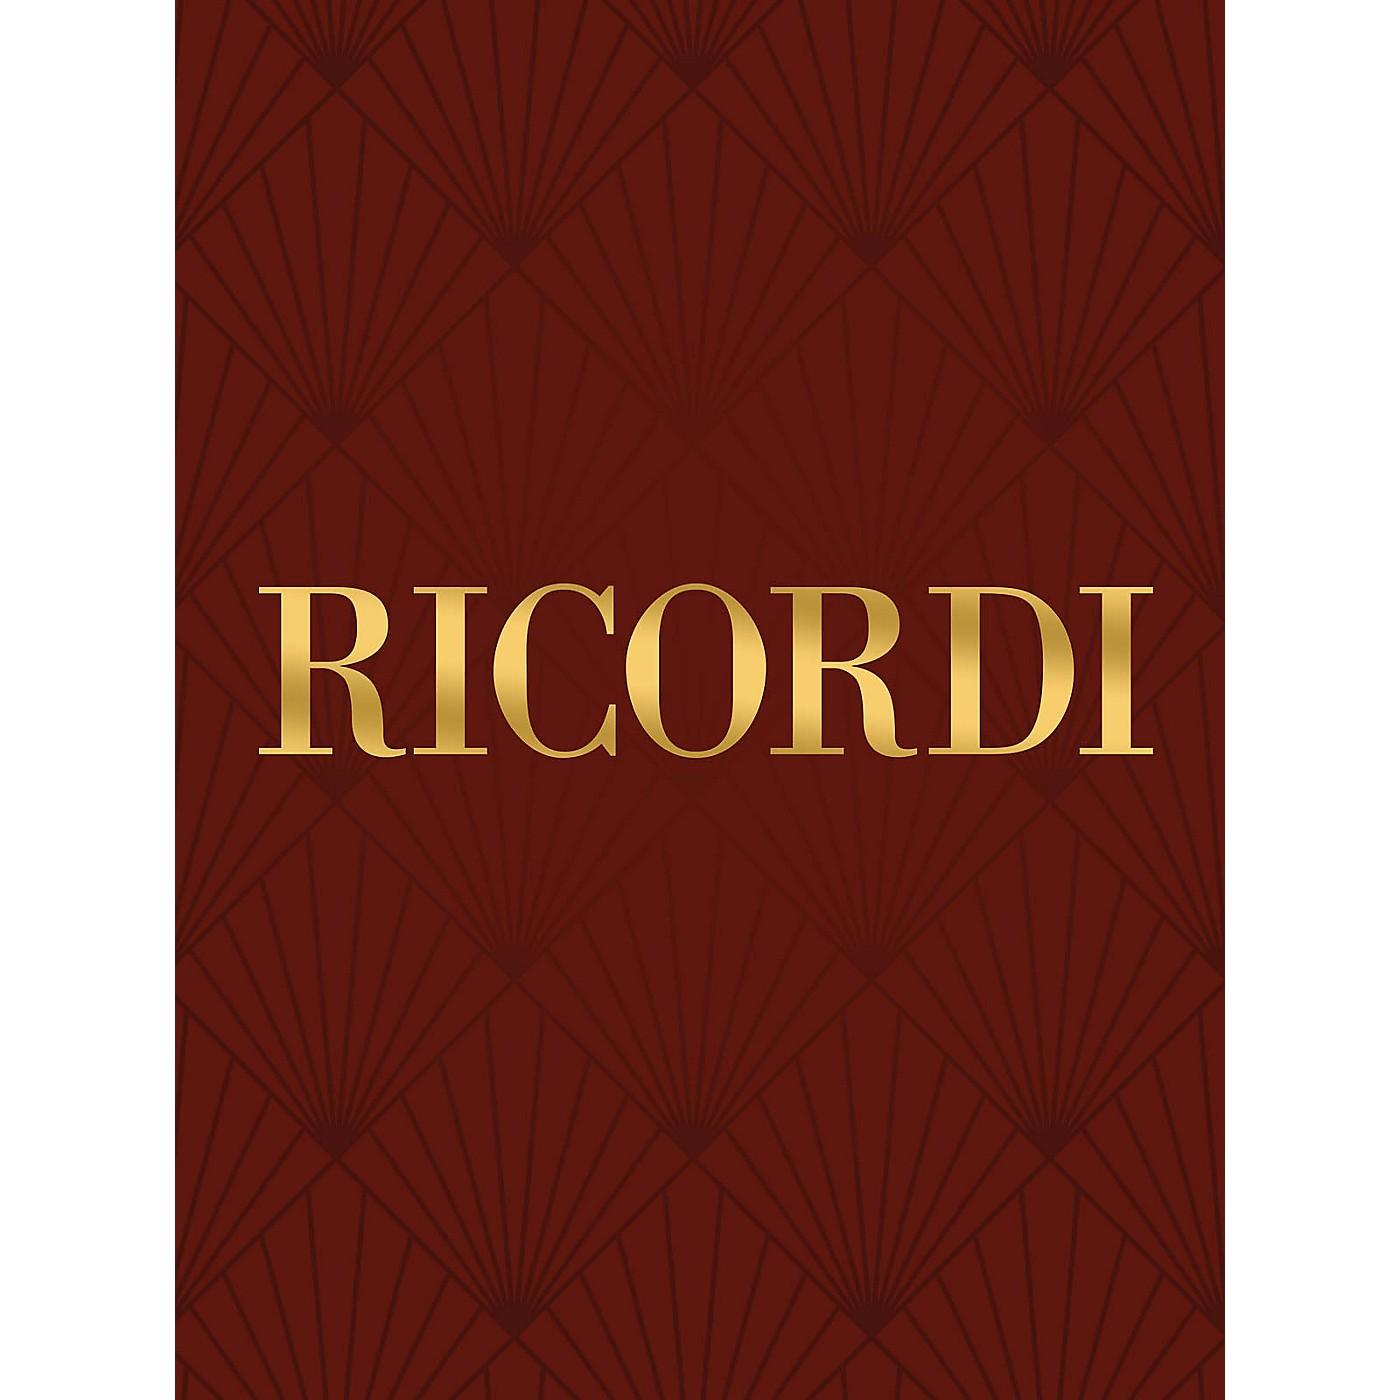 Hal Leonard Falstaff Vocal Score Italian Vocal Score Series Composed by Giuseppe Verdi thumbnail